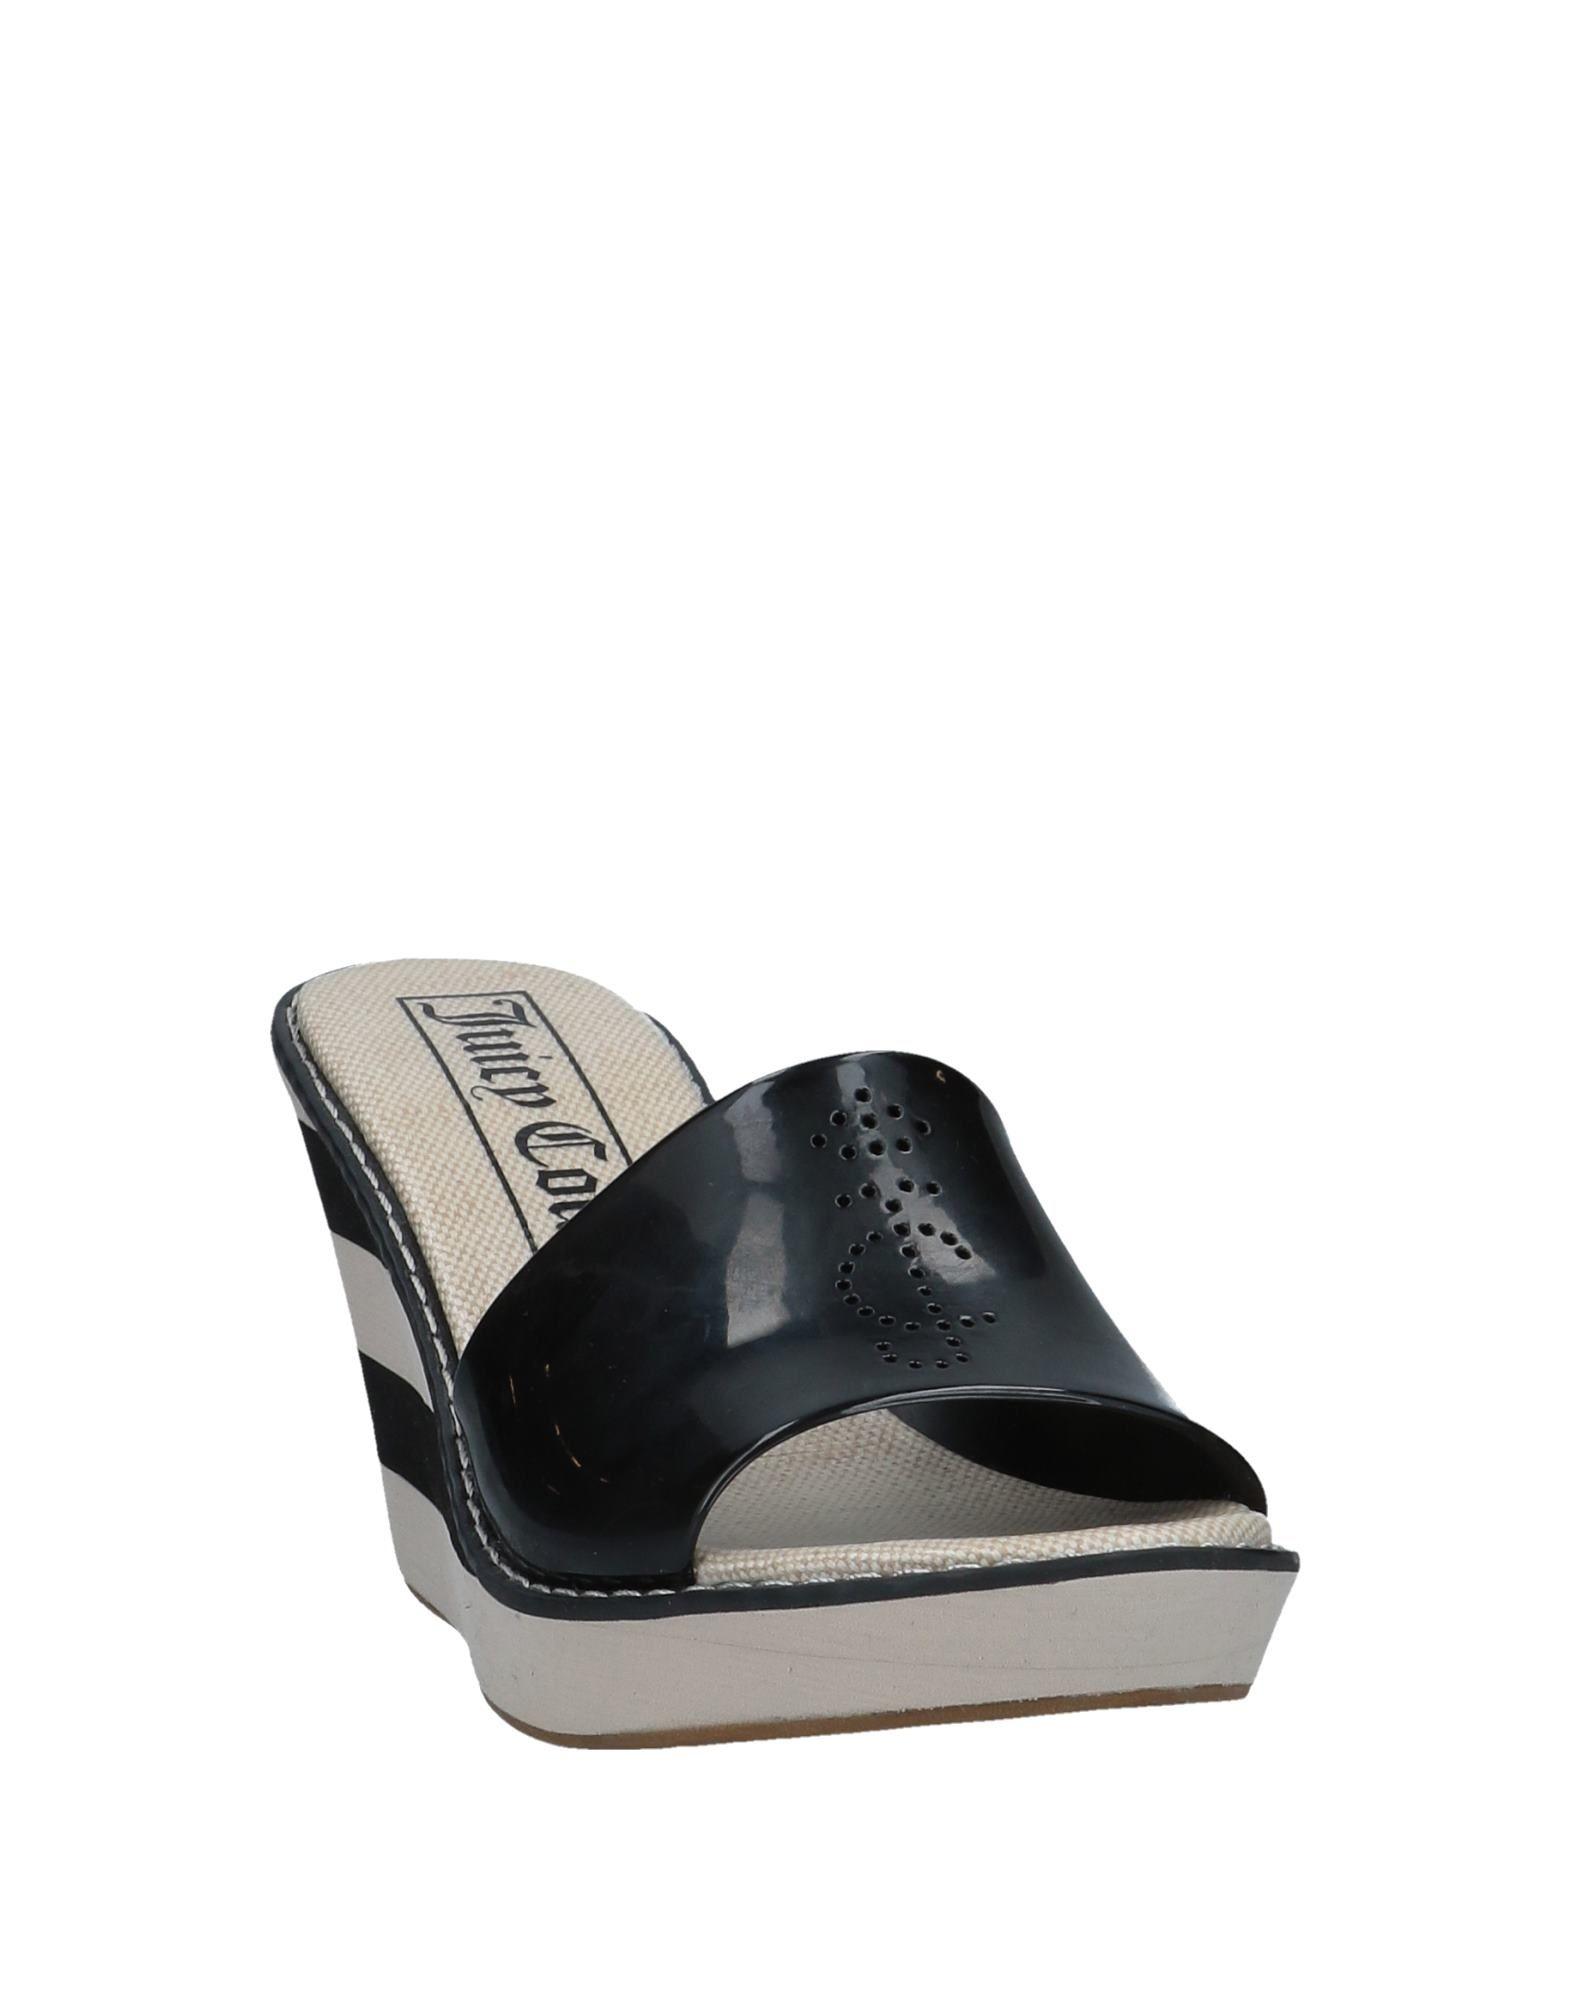 Stilvolle Couture billige Schuhe Juicy Couture Stilvolle Sandalen Damen  11552506FS b58d09